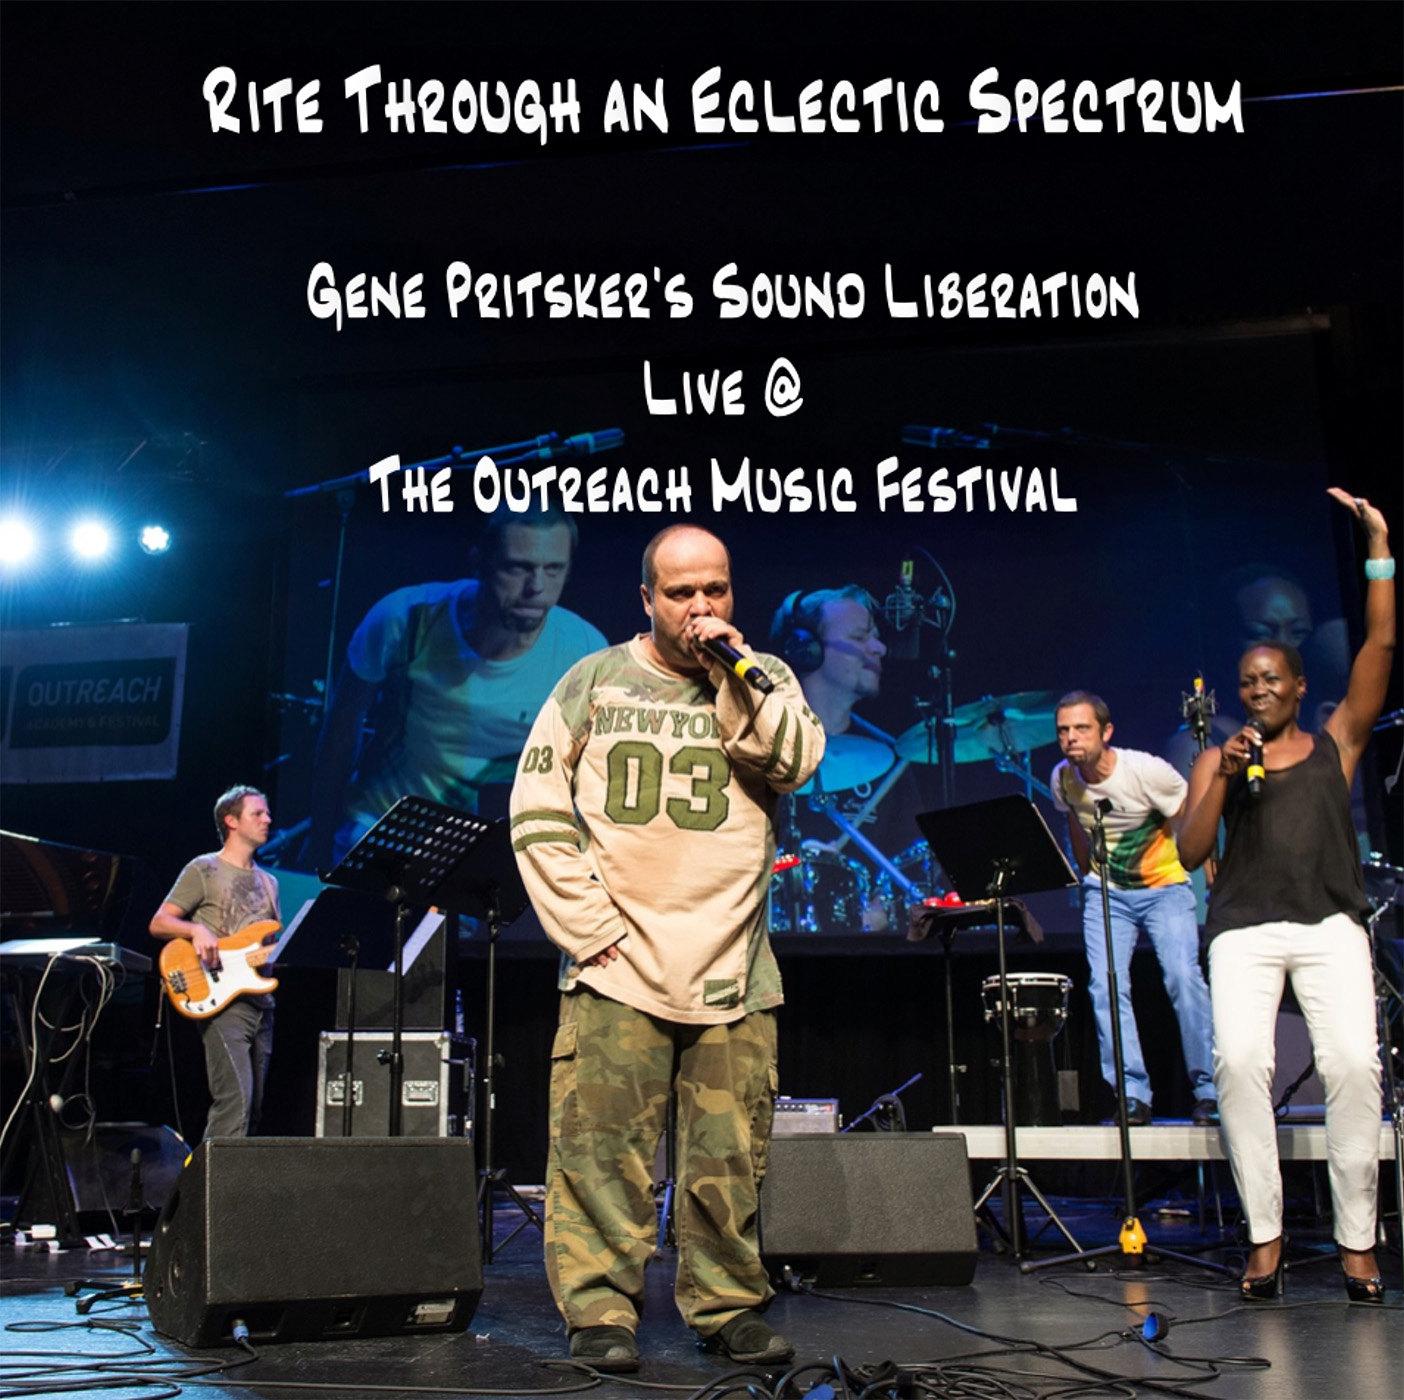 Gene Pritsker's Sound Liberation: Rite Through an Eclectic Spectrum